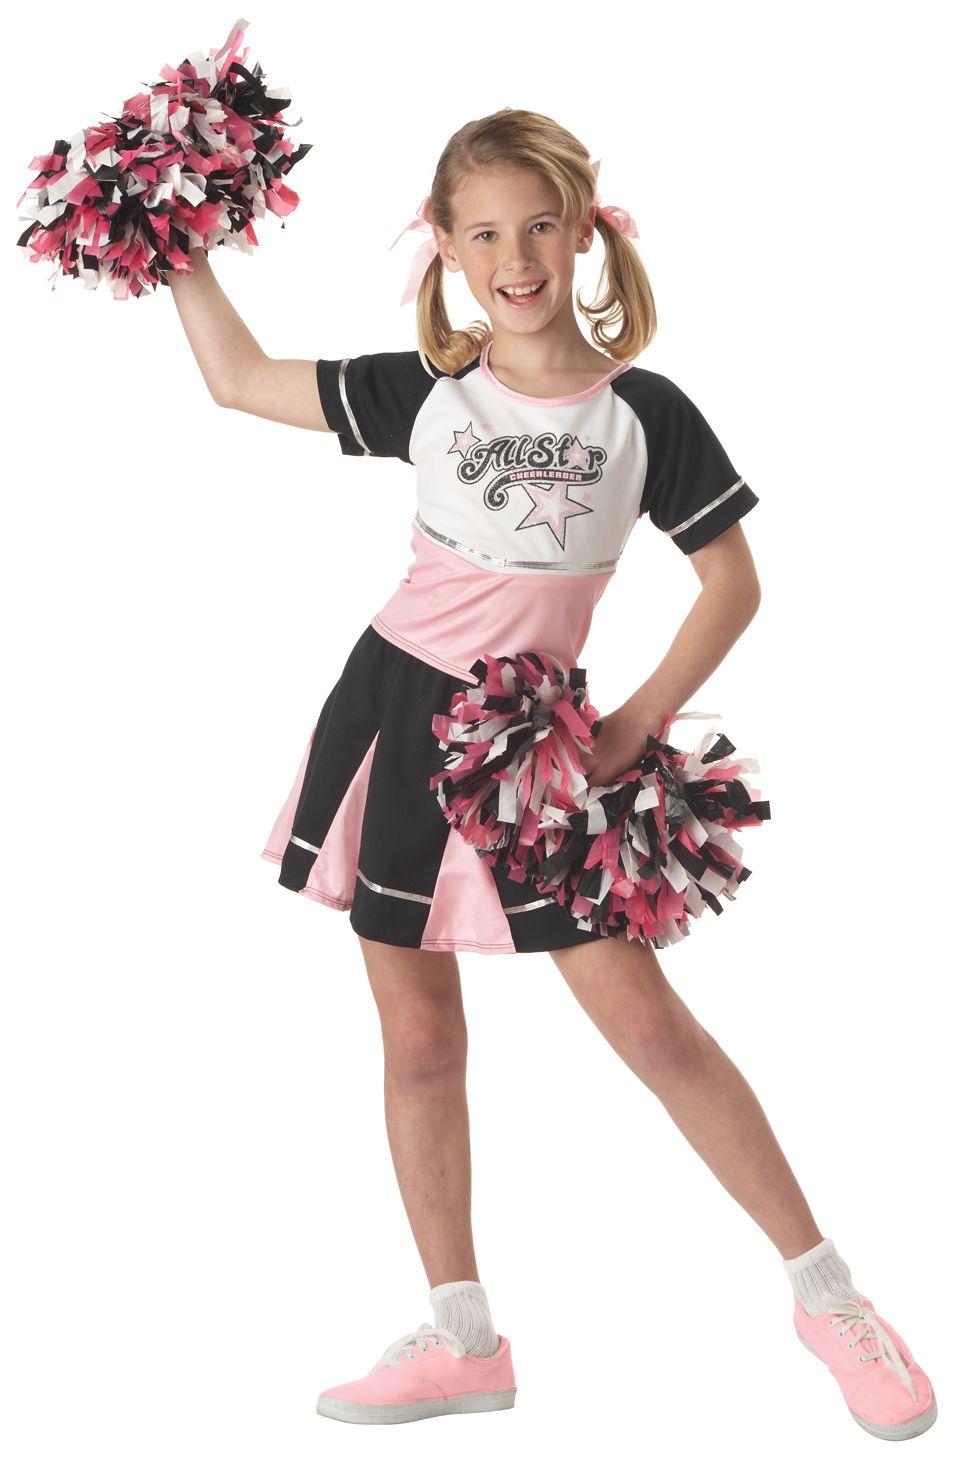 Ladies Cheerleader Kit American High School Fancy Dress Pom Poms Adults New